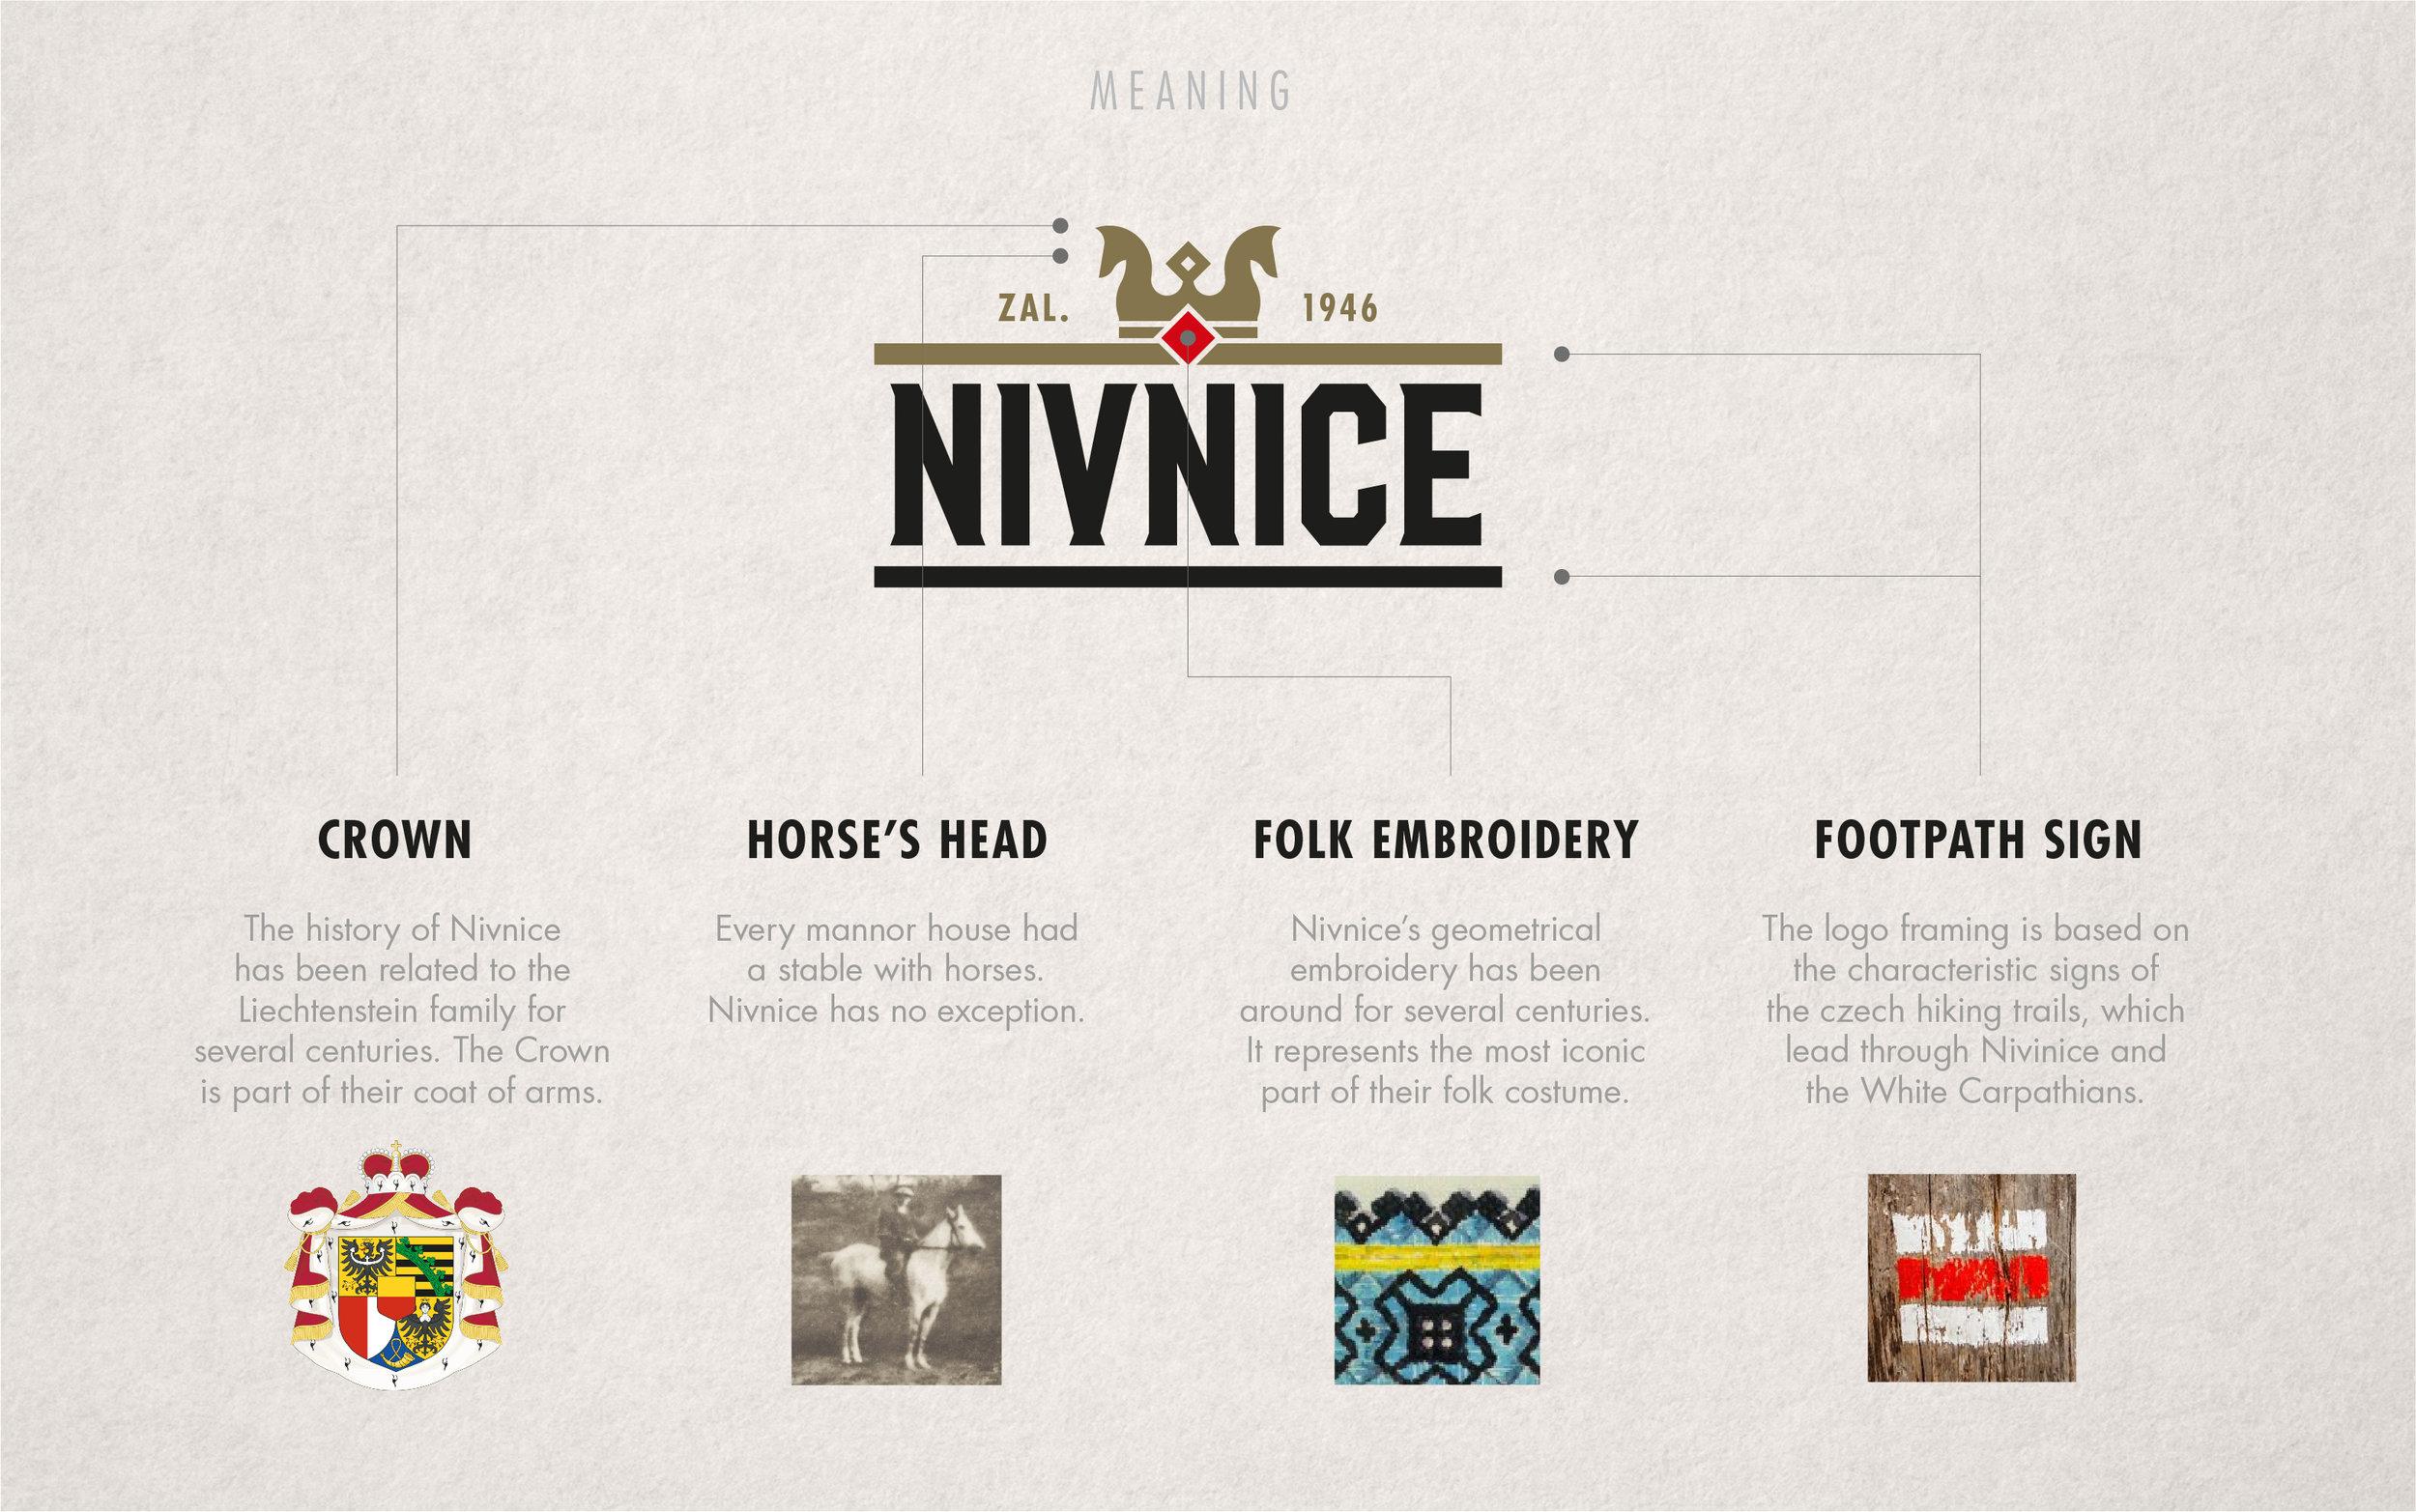 Linea Nivnice lihoviny logo meaning-08.jpg